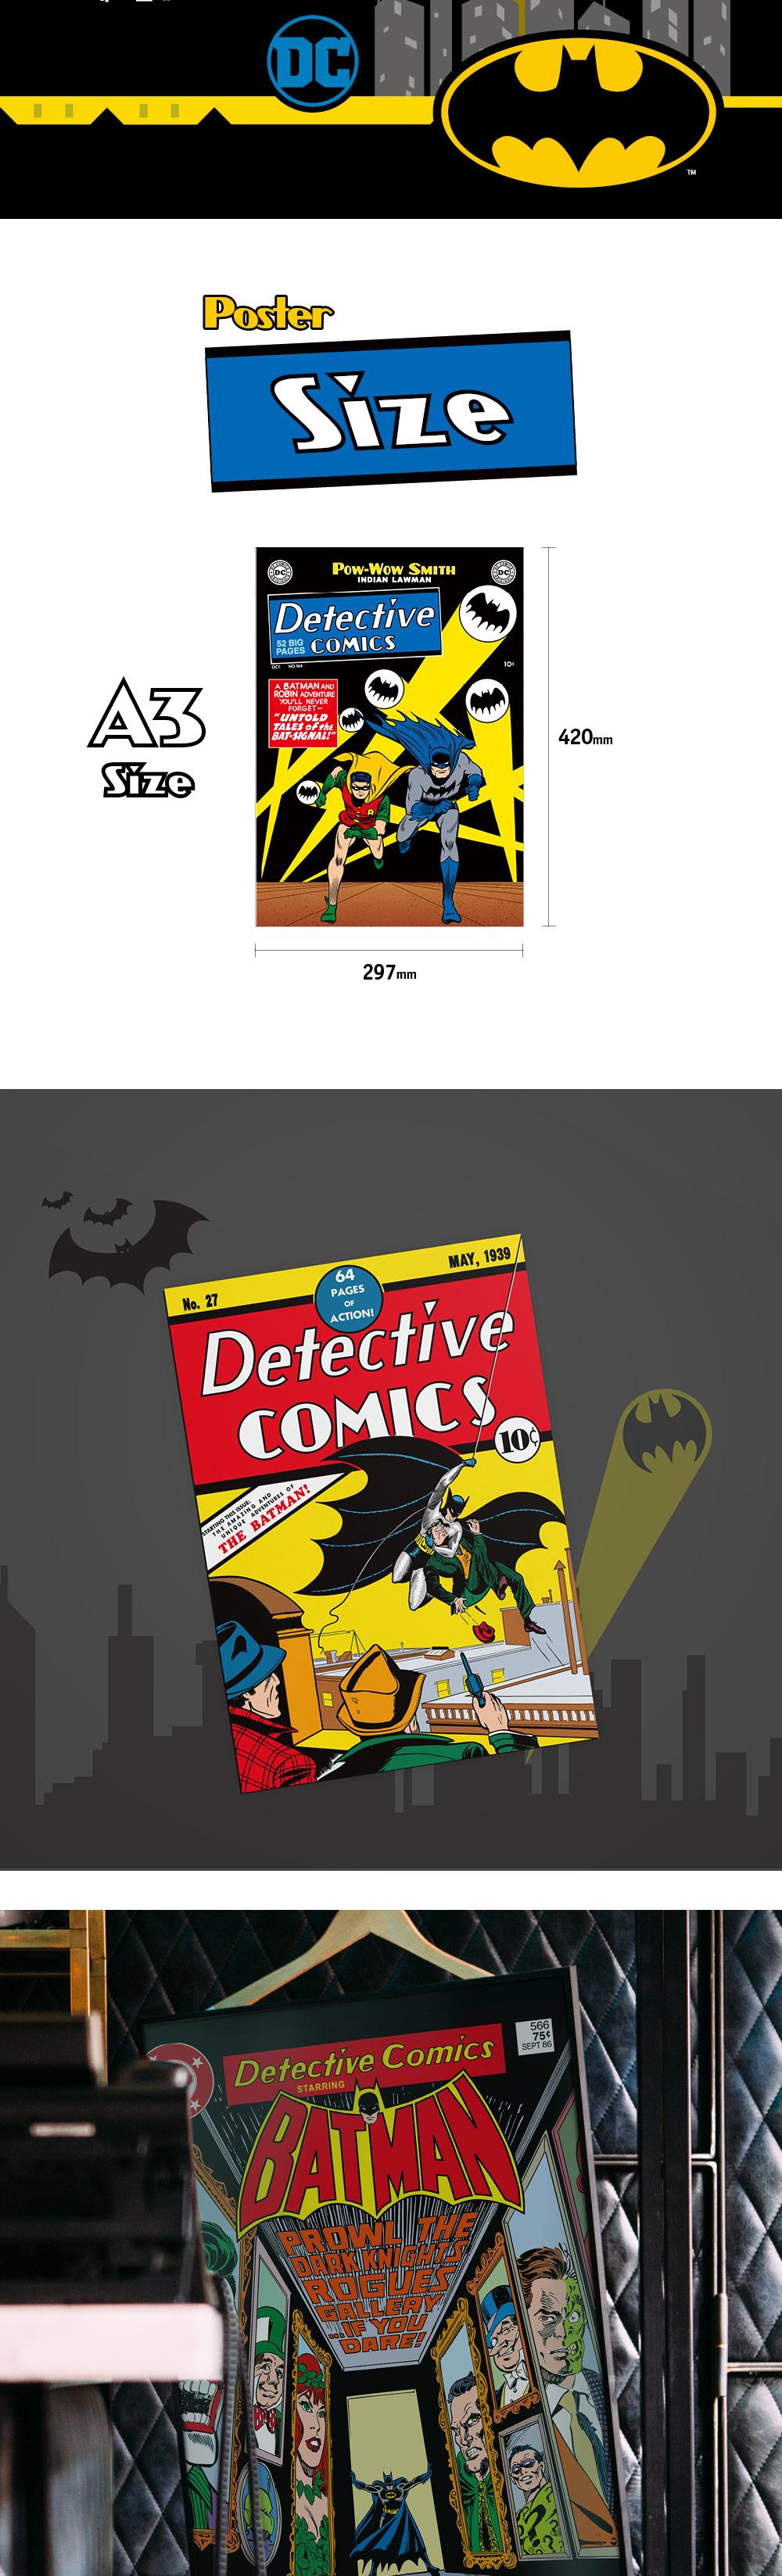 DC코믹스 인테리어 포스터_배트맨_03.jpg